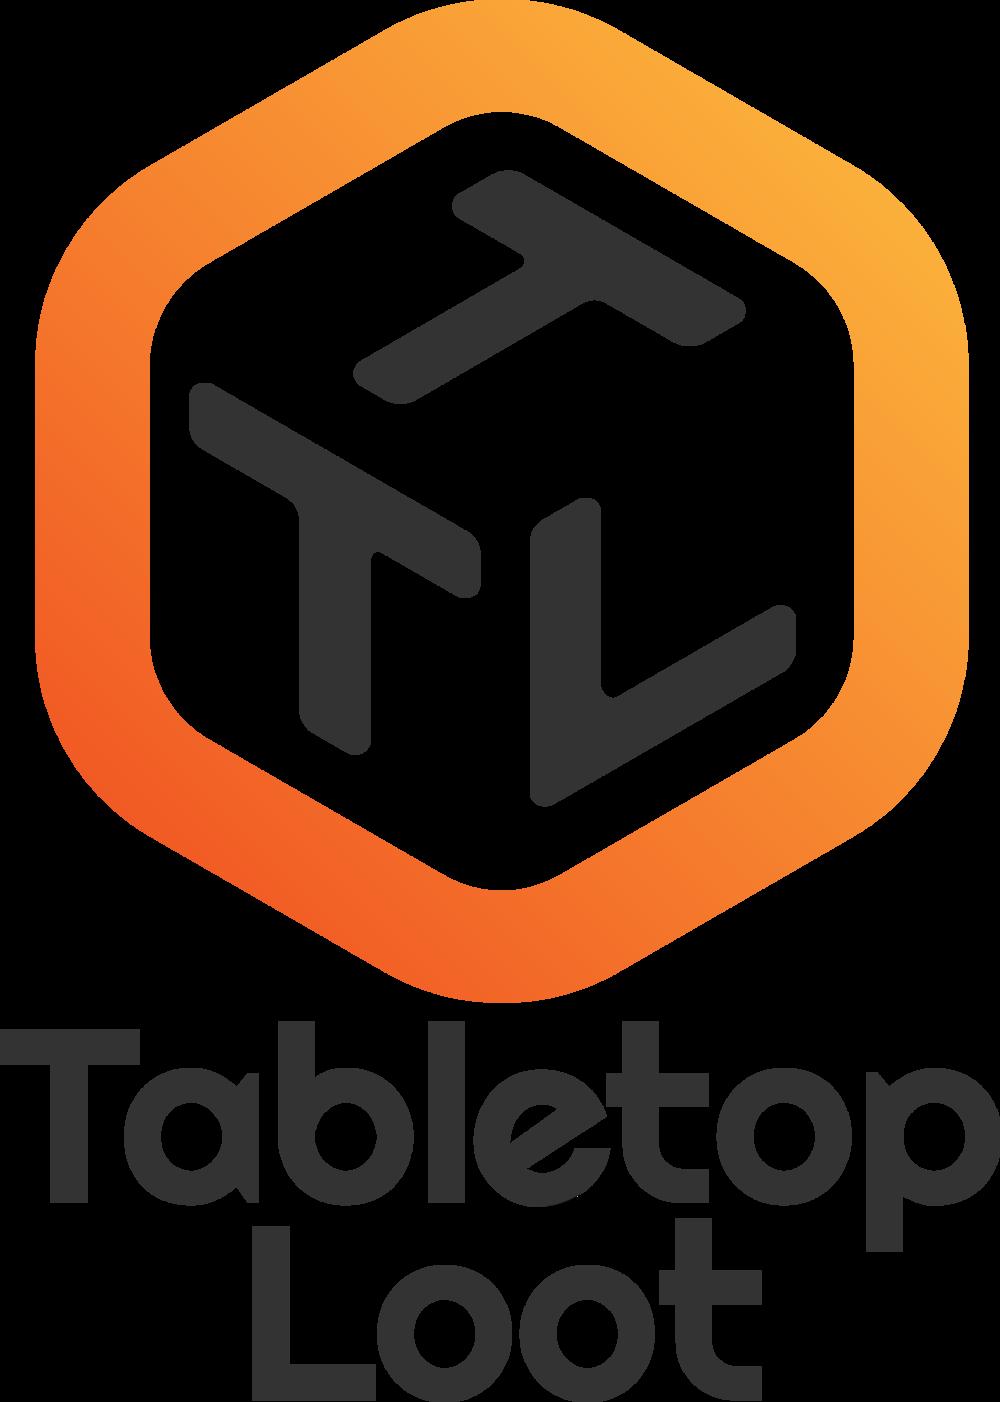 Tabletop Loot Logo.png